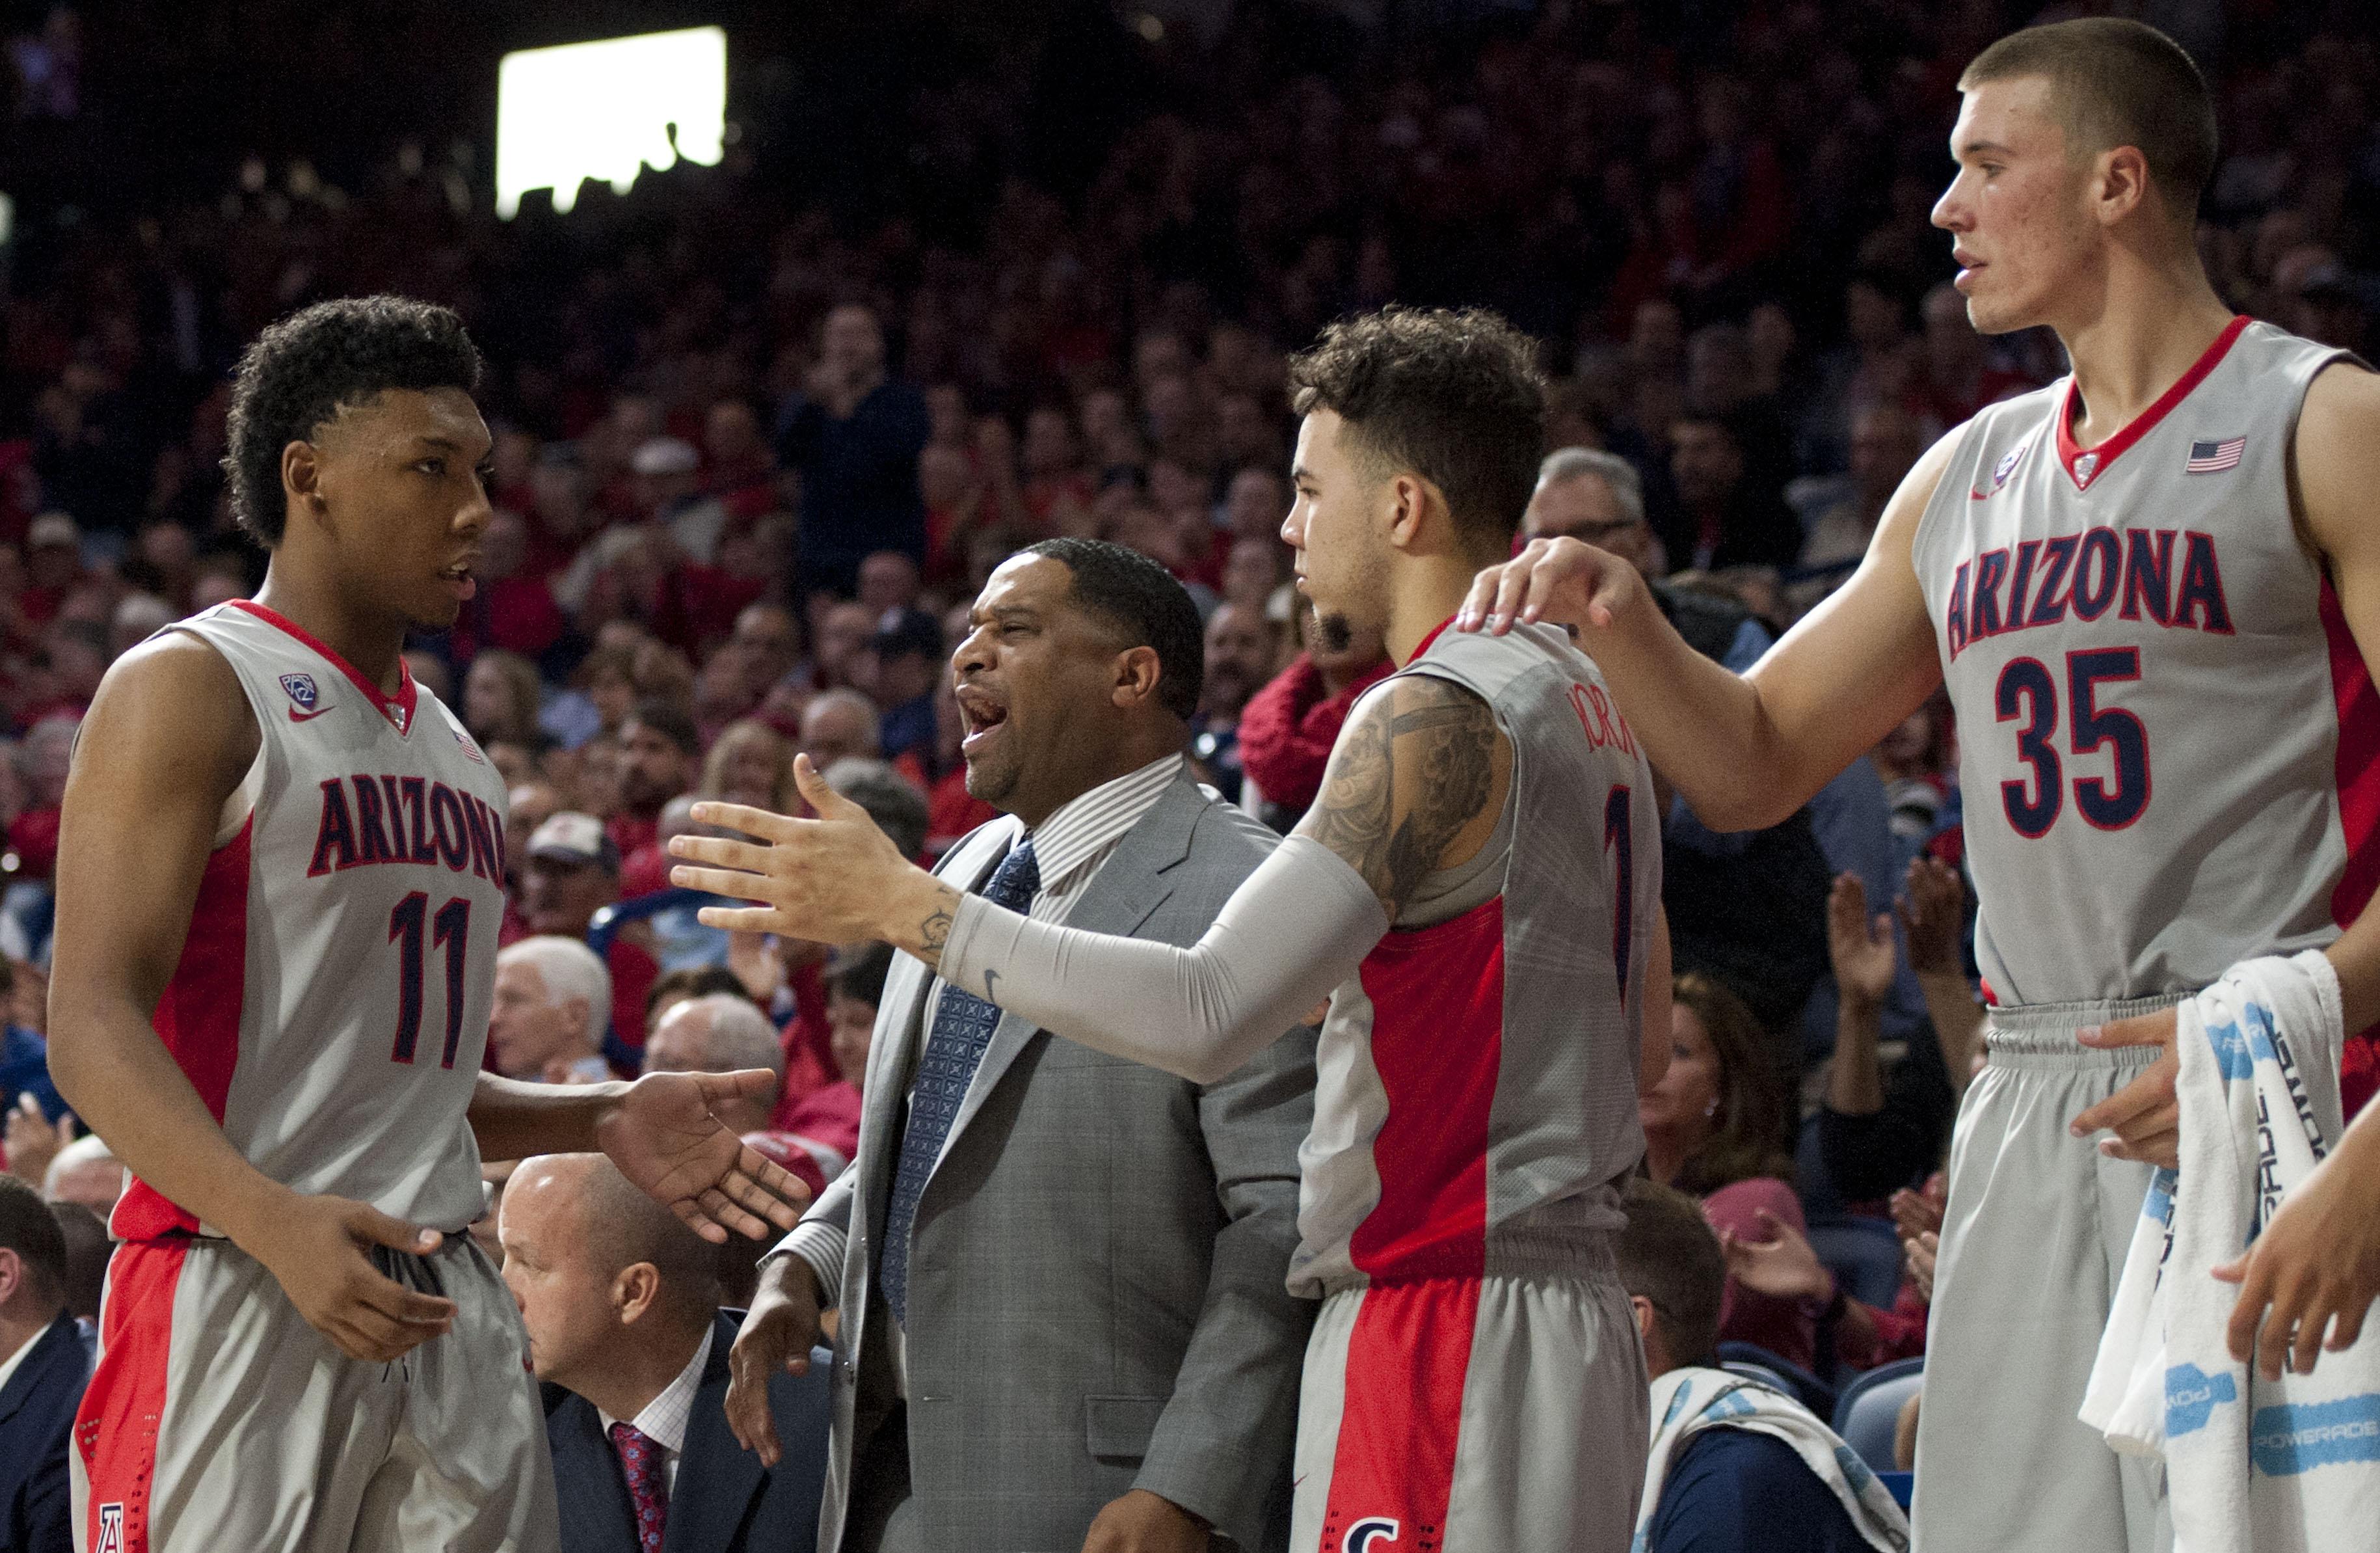 NCAA Basketball: Bradley at Arizona